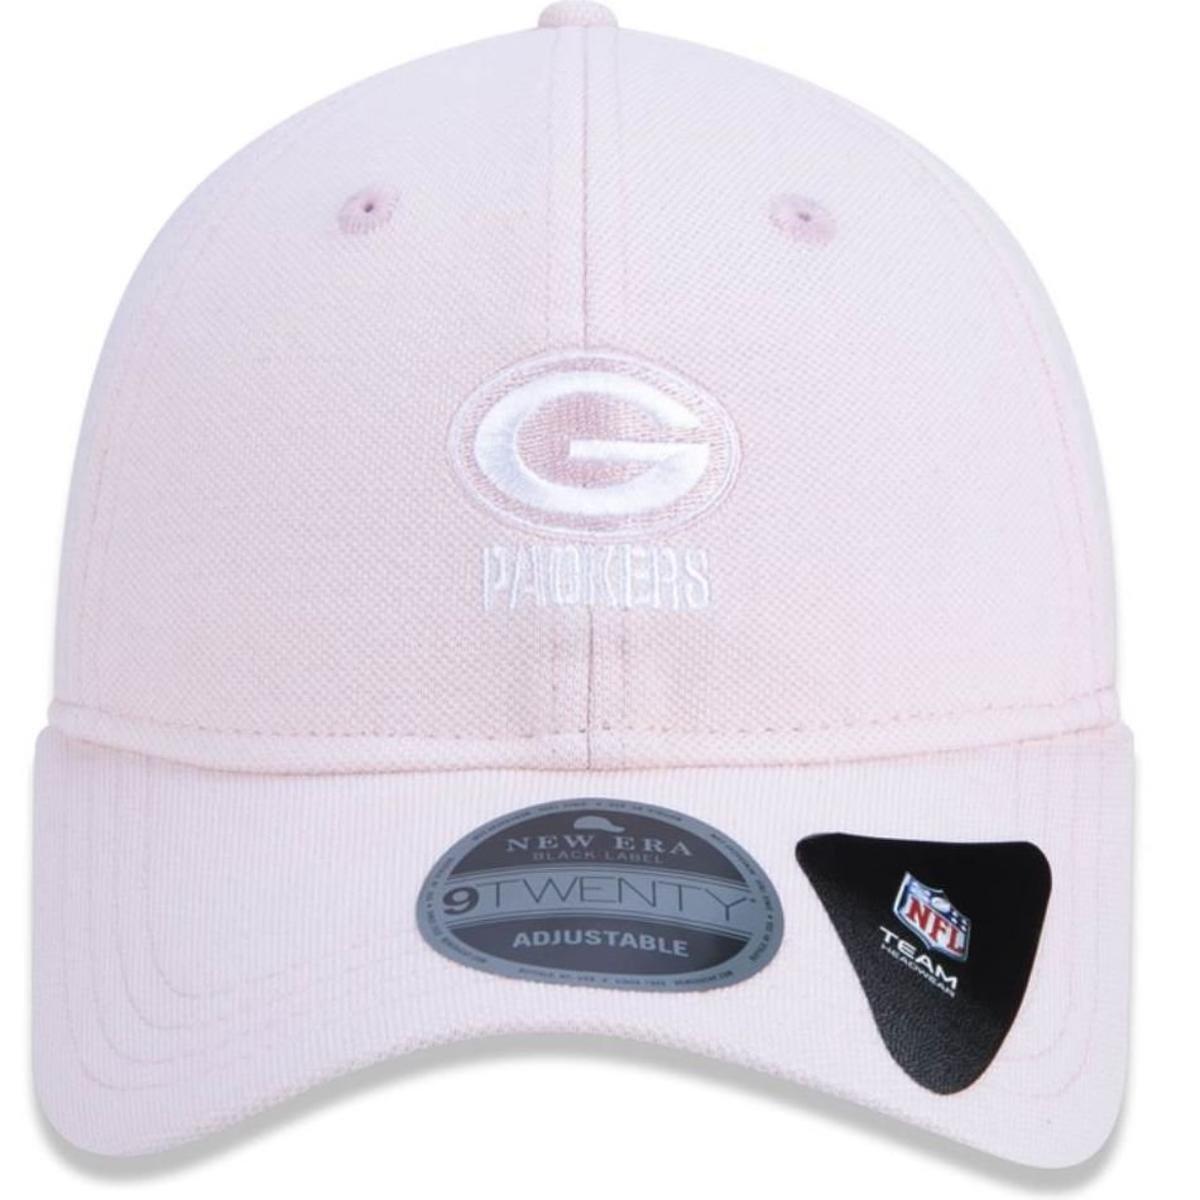 Boné Green Bay Packers Micro Stitch Rosa New Era - Rosa - Compre ... 55d401361fa